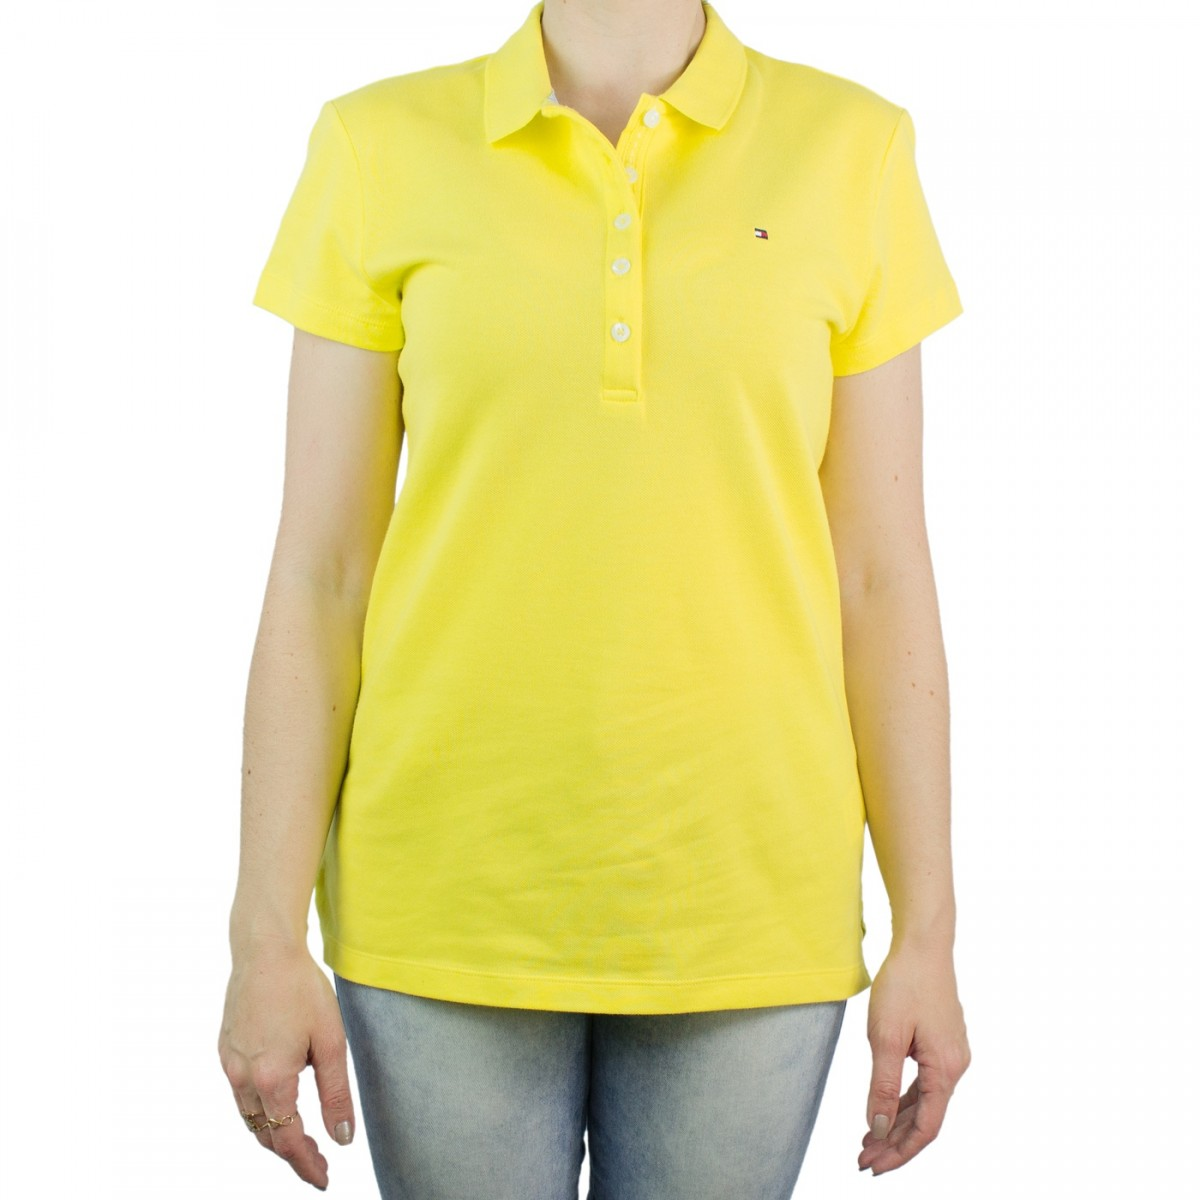 c68148dcc3 Bizz Store - Camisa Polo Feminina Tommy Hilfiger Amarela Slim